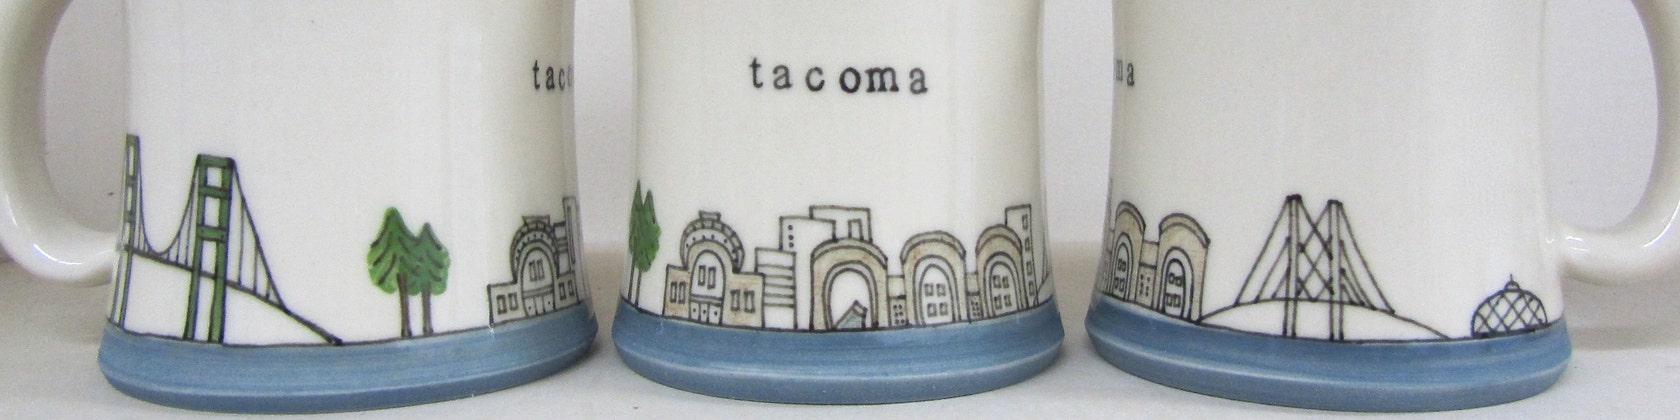 handmade tableware that celebrates home von DowningPottery auf Etsy